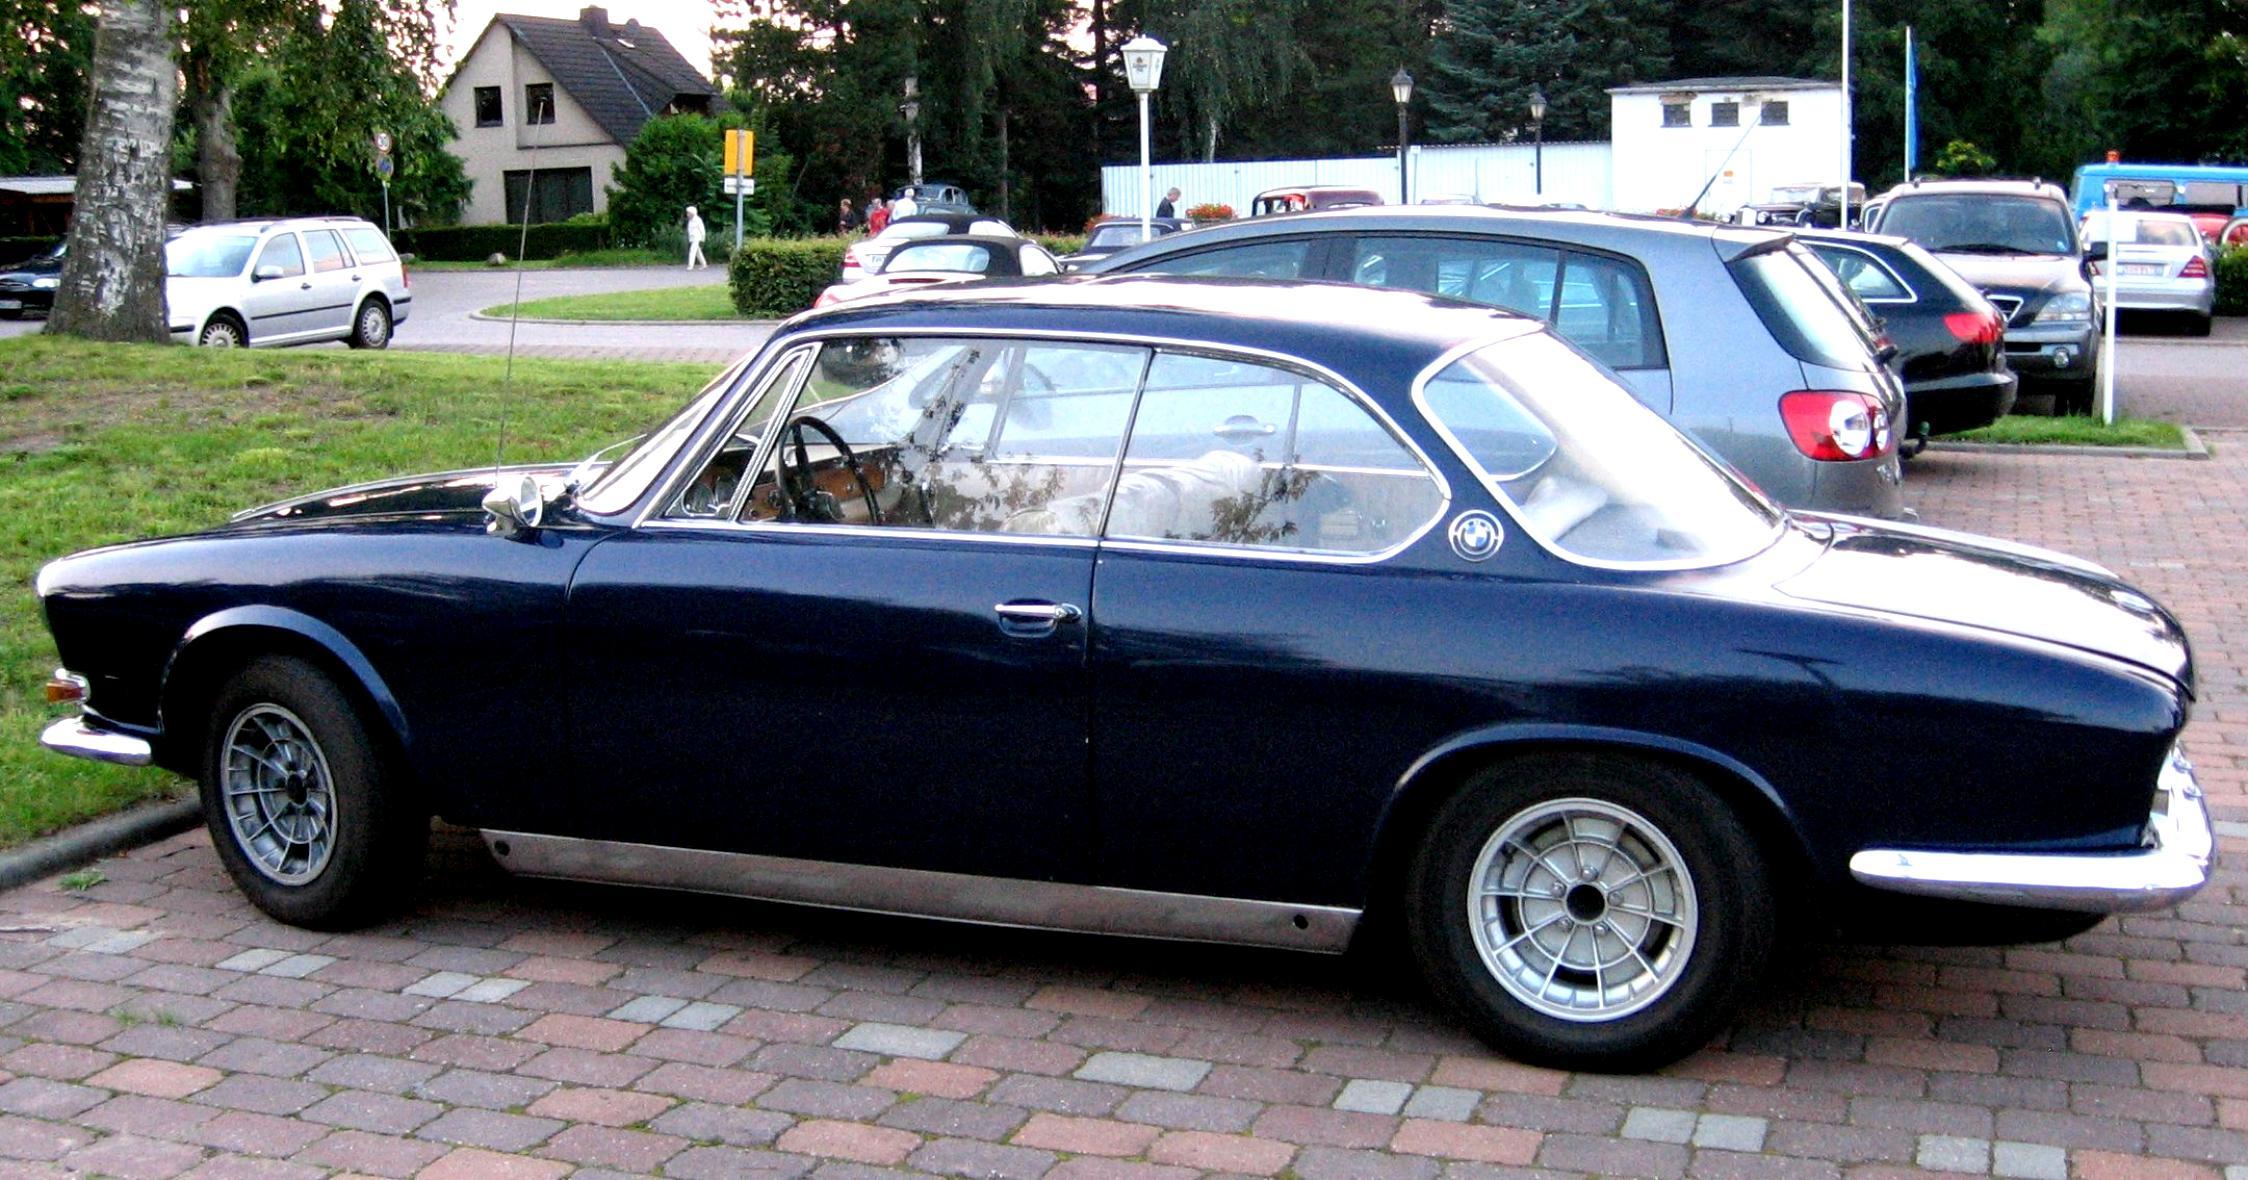 BMW 3200 Coupe CS 1962 on MotoImg.com